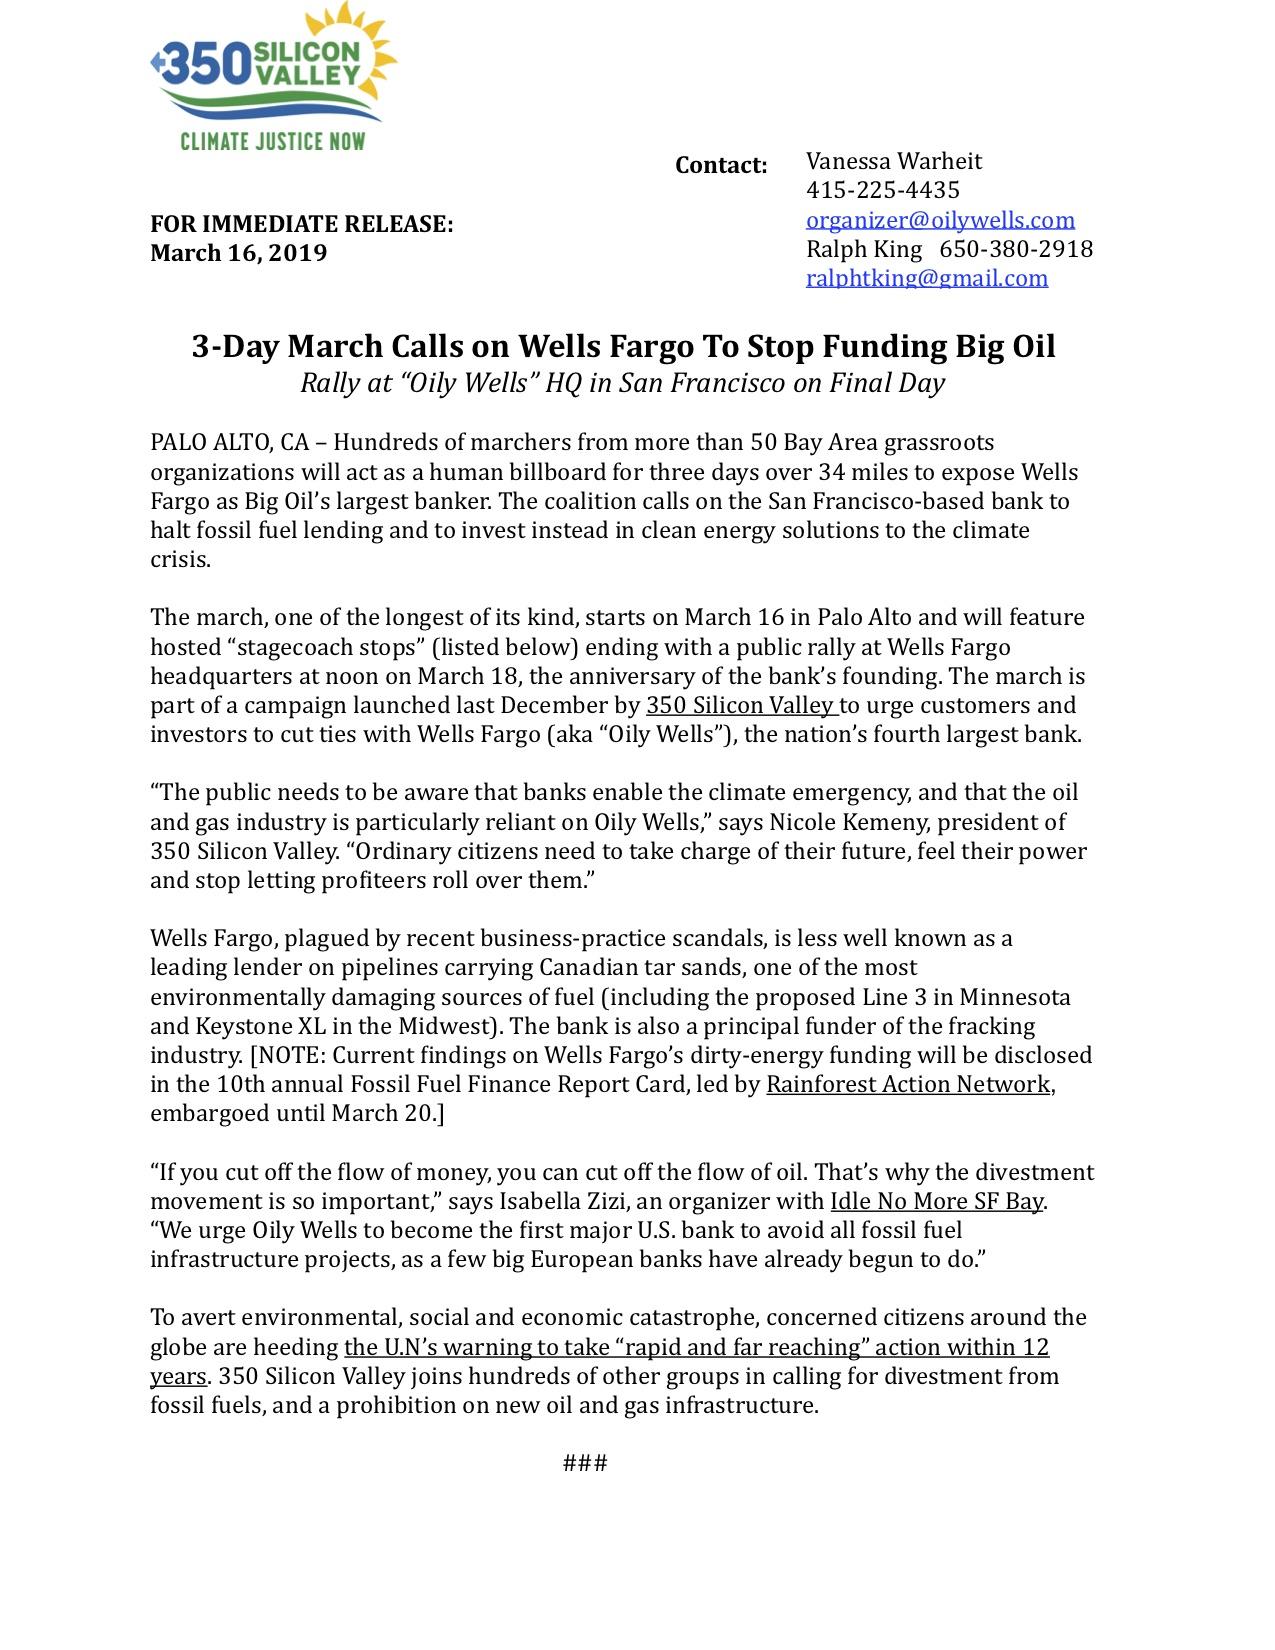 March 16 Press Release